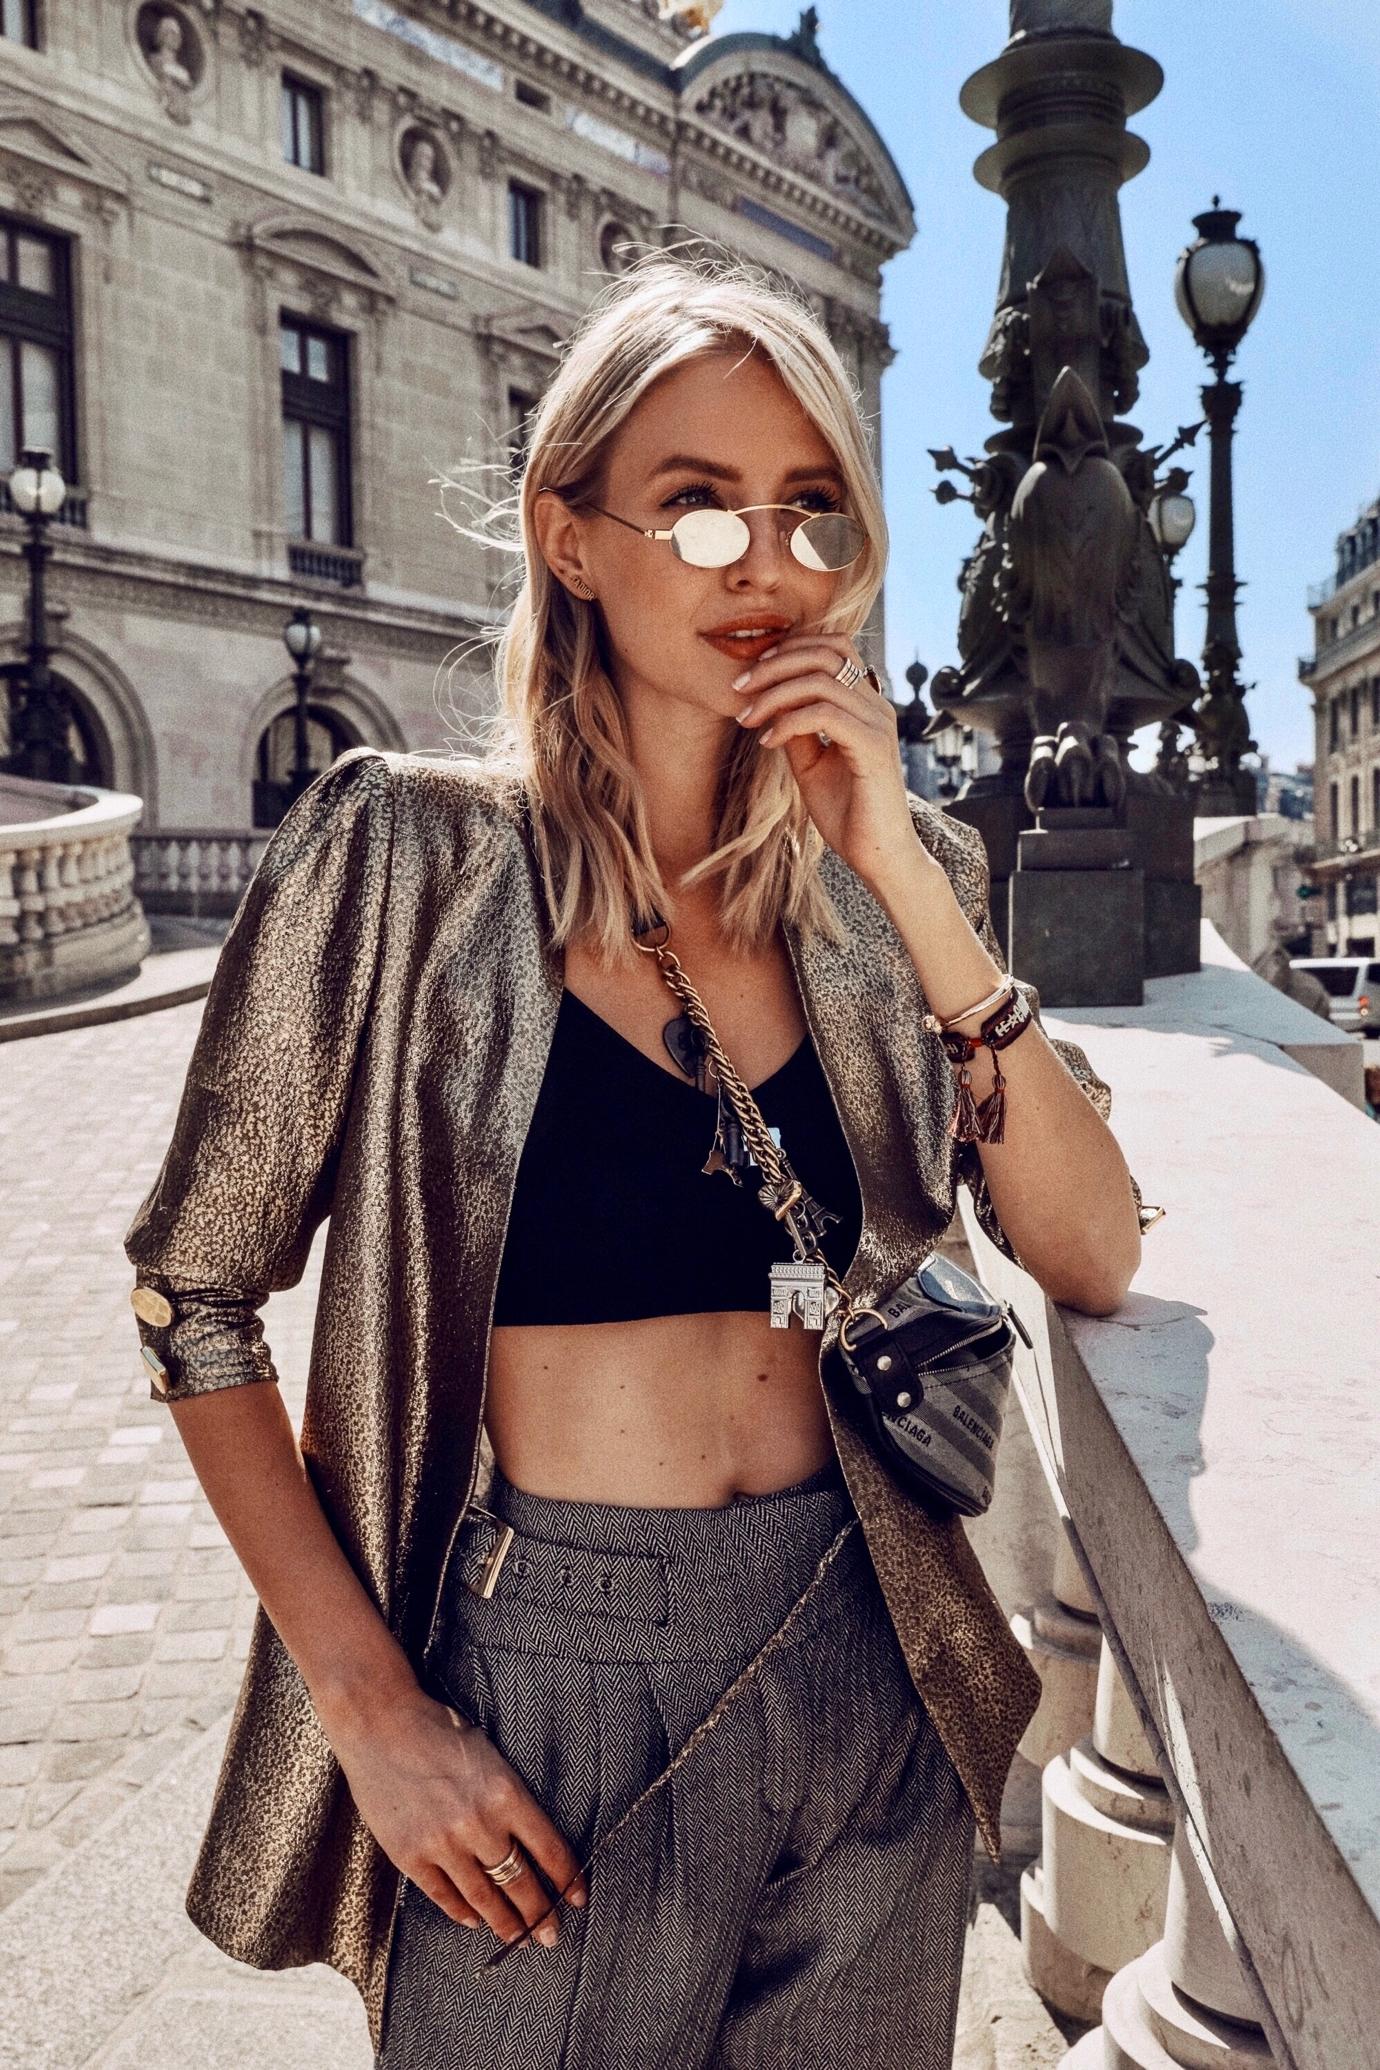 Leonie Hanne metallic grey outfit Paris - Leonie Hanne